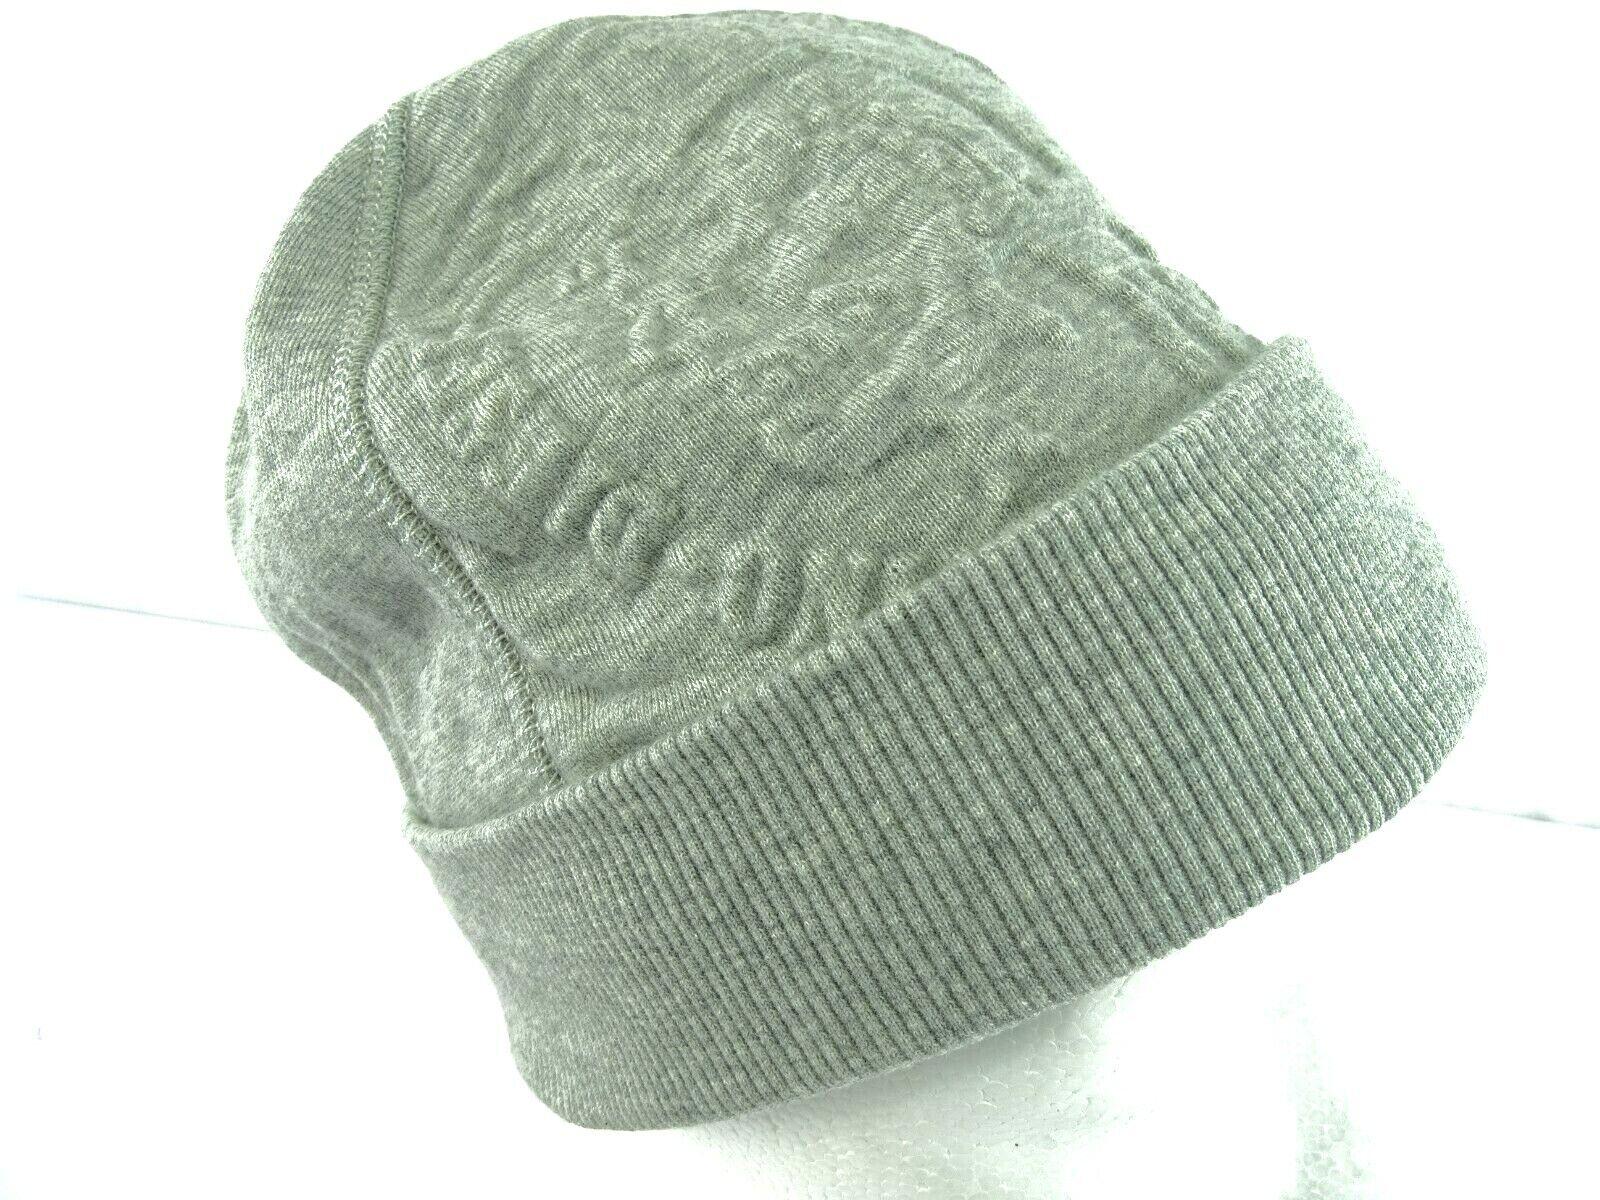 Diesel cipollyn Berretto fleecemütze Winter Hat Beanie Hat Mens Ladies